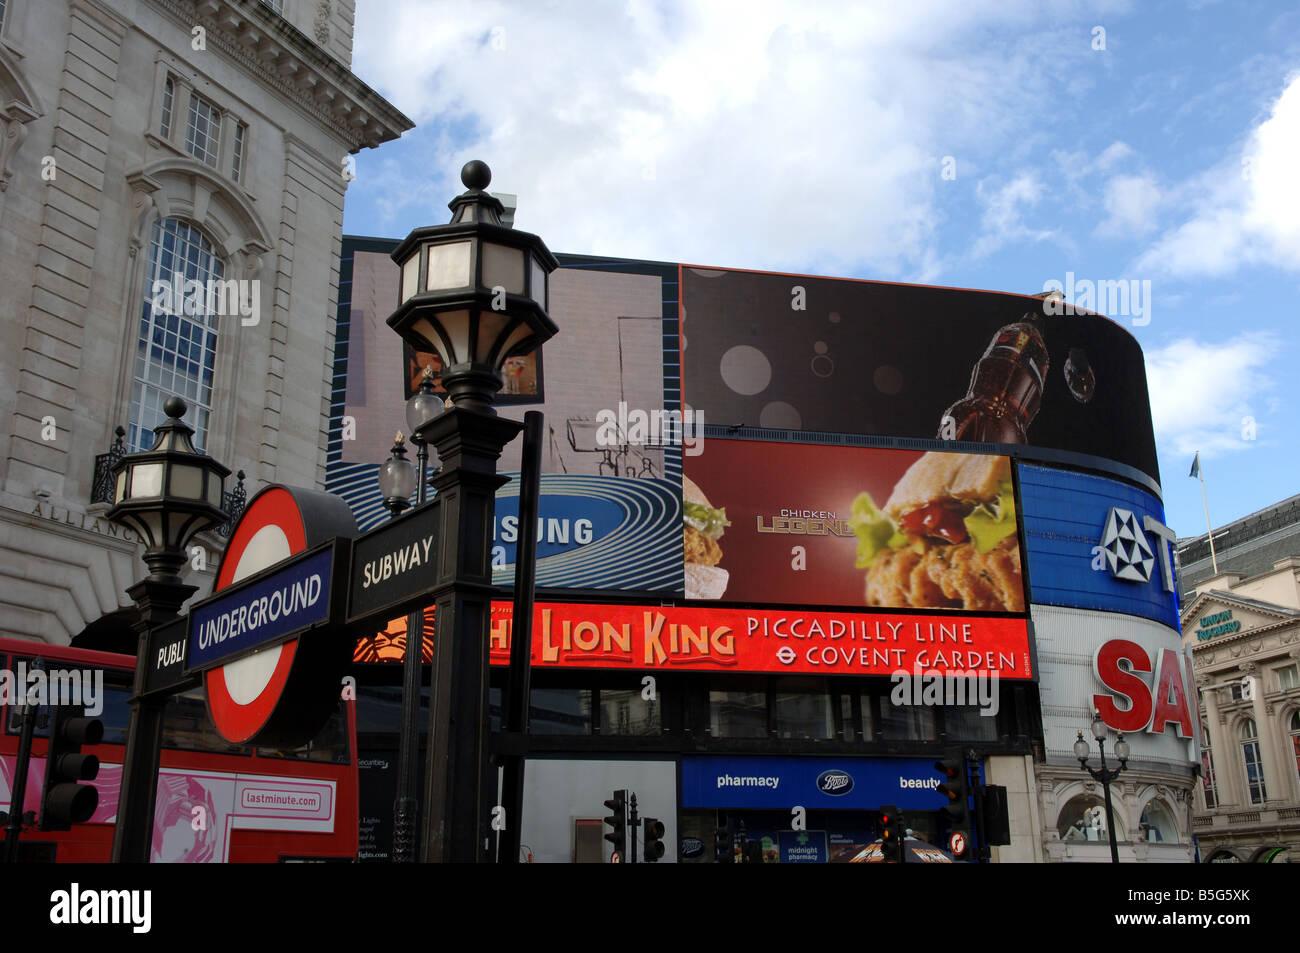 London Groß Britannien 2008 London Great Britain 2008 - Stock Image